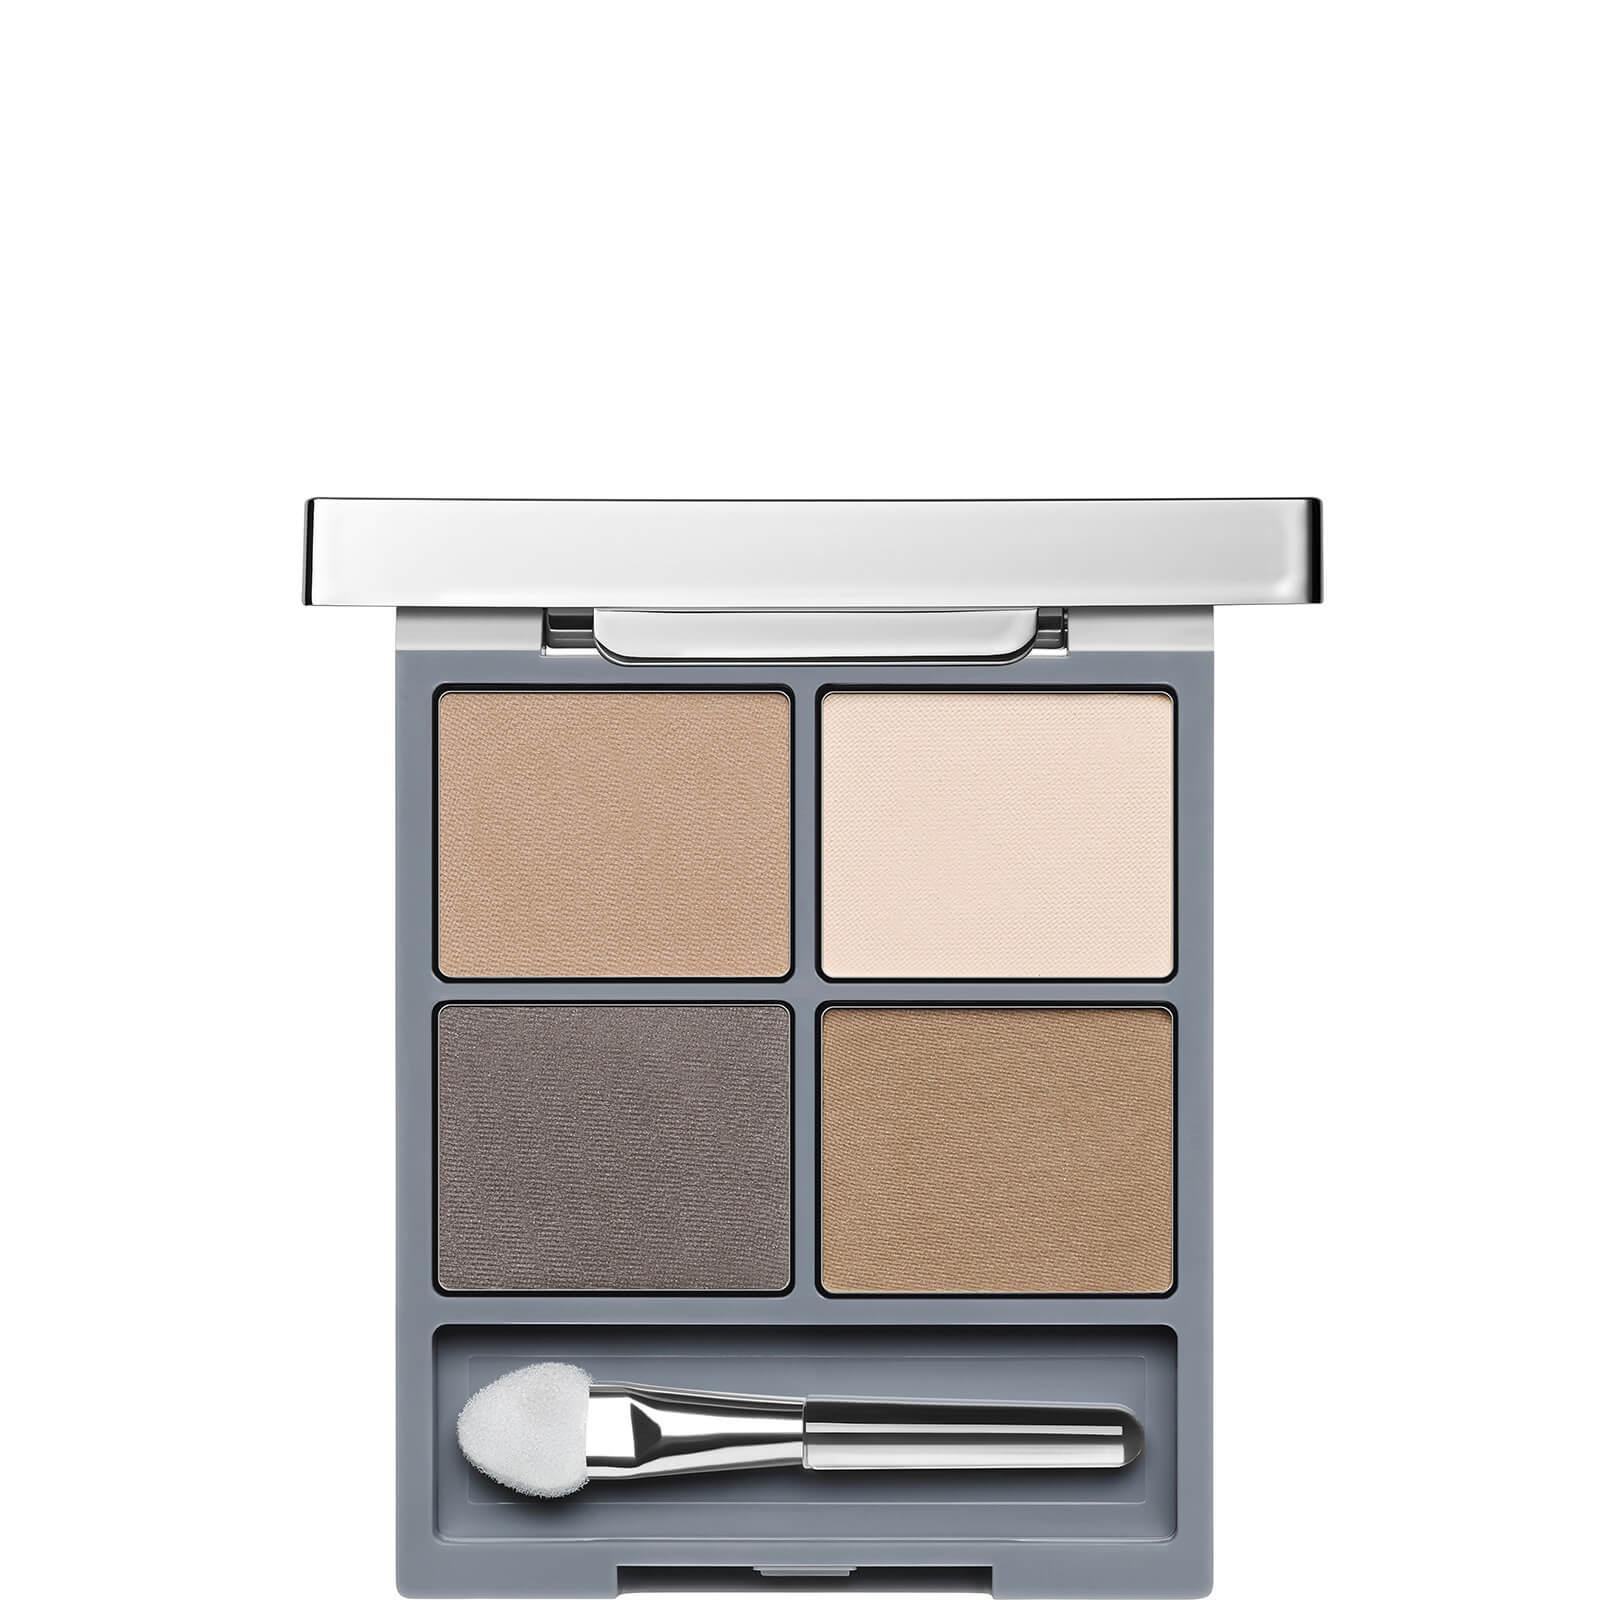 Physicians Formula The Healthy Eyeshadow 6g (Various Shades) - Canyon Classic